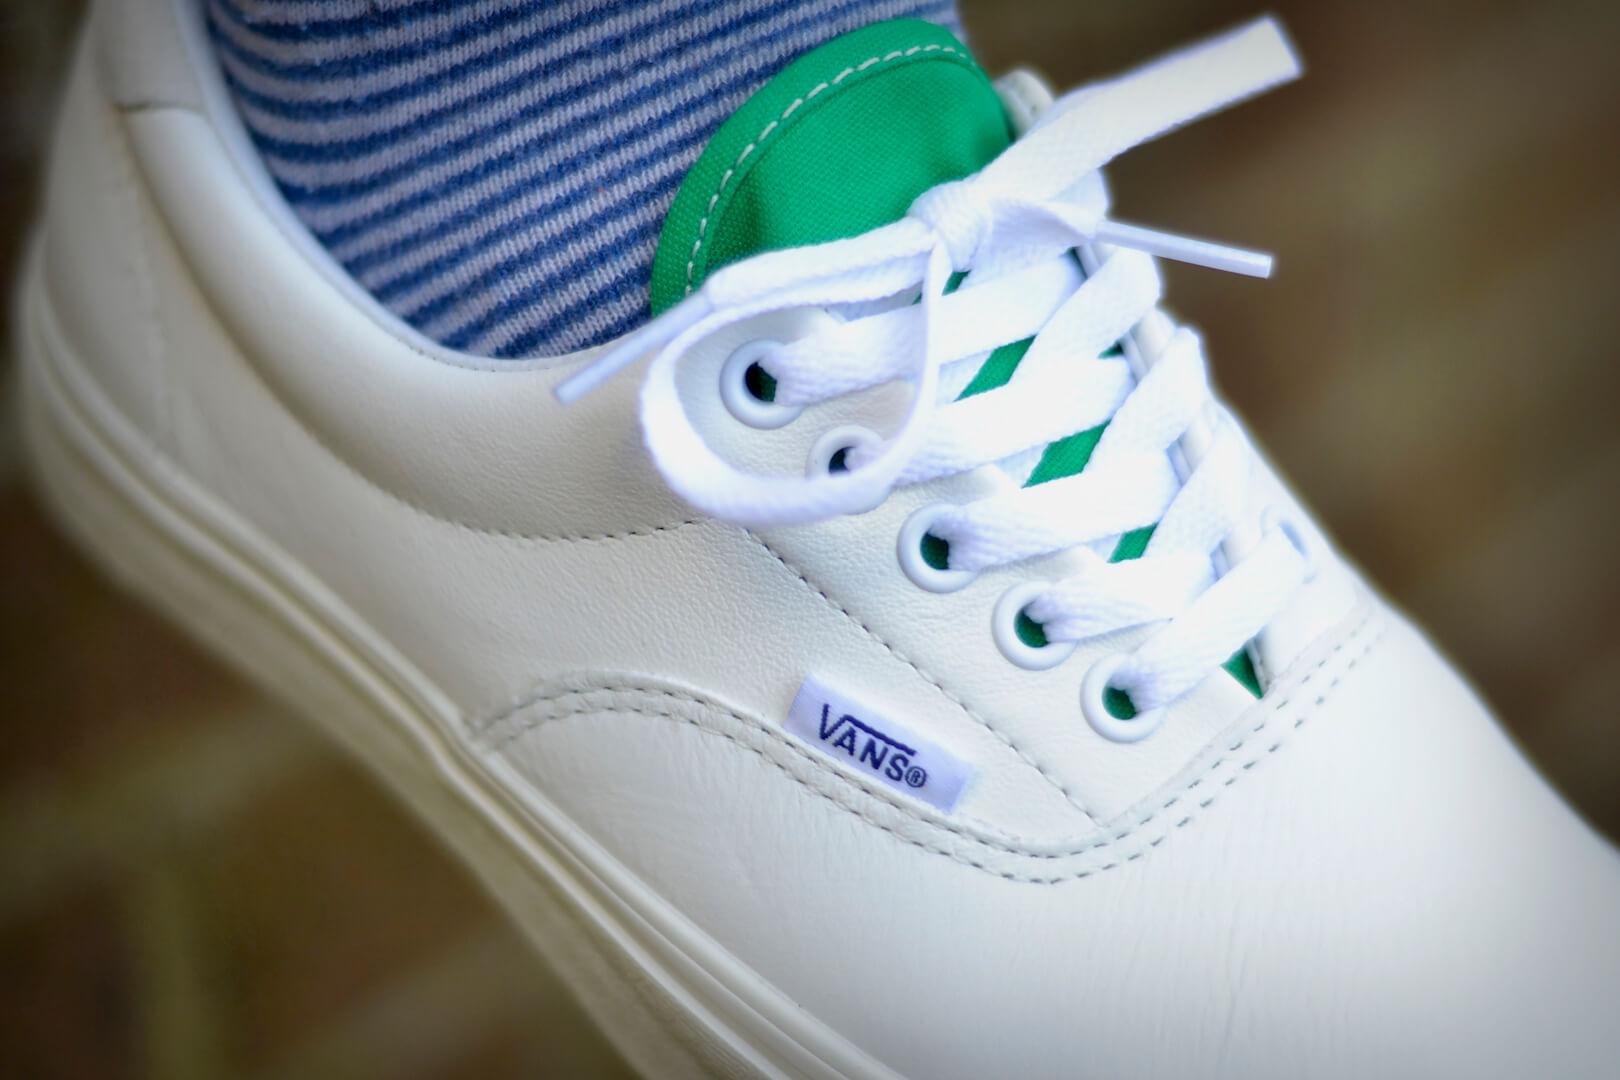 6b100f6c38 Vans Vintage Sport Era 59 – True White Kelly Green · era white kelly green  · era white kelly green2 · era white kelly green3